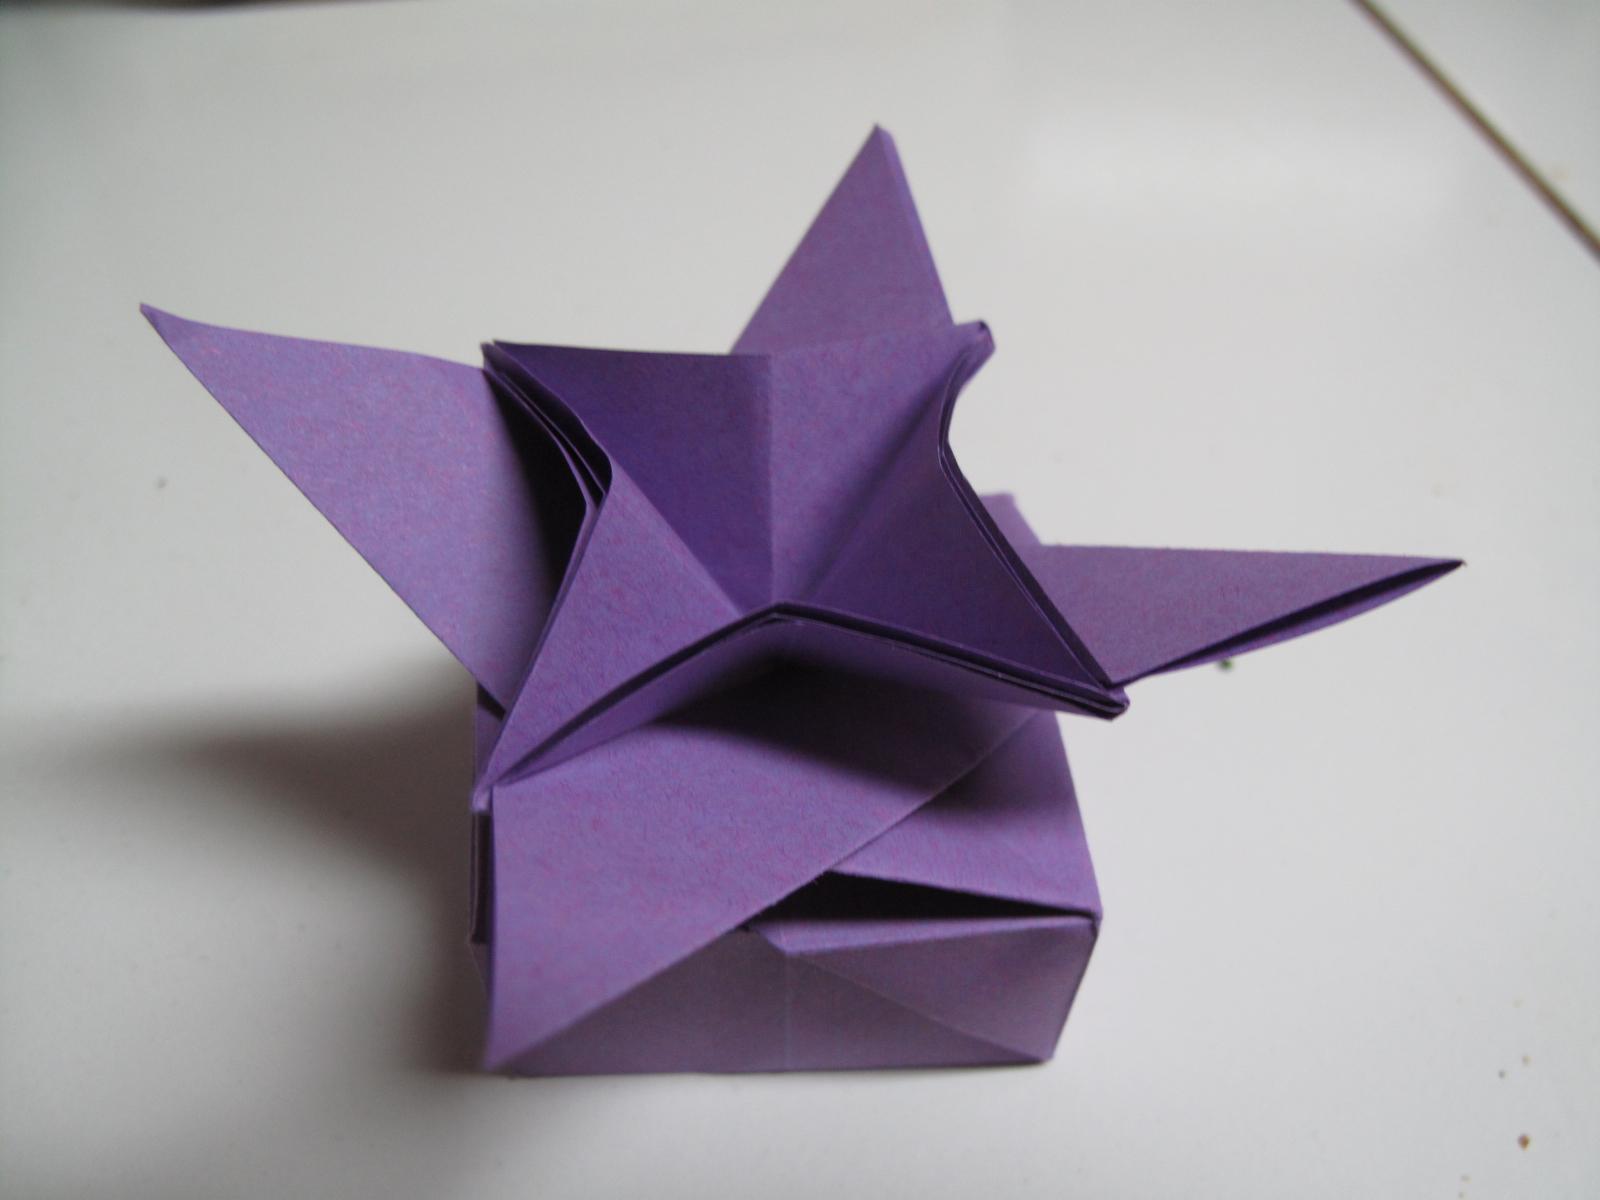 origami flower box | Bahamasblogg - photo#30